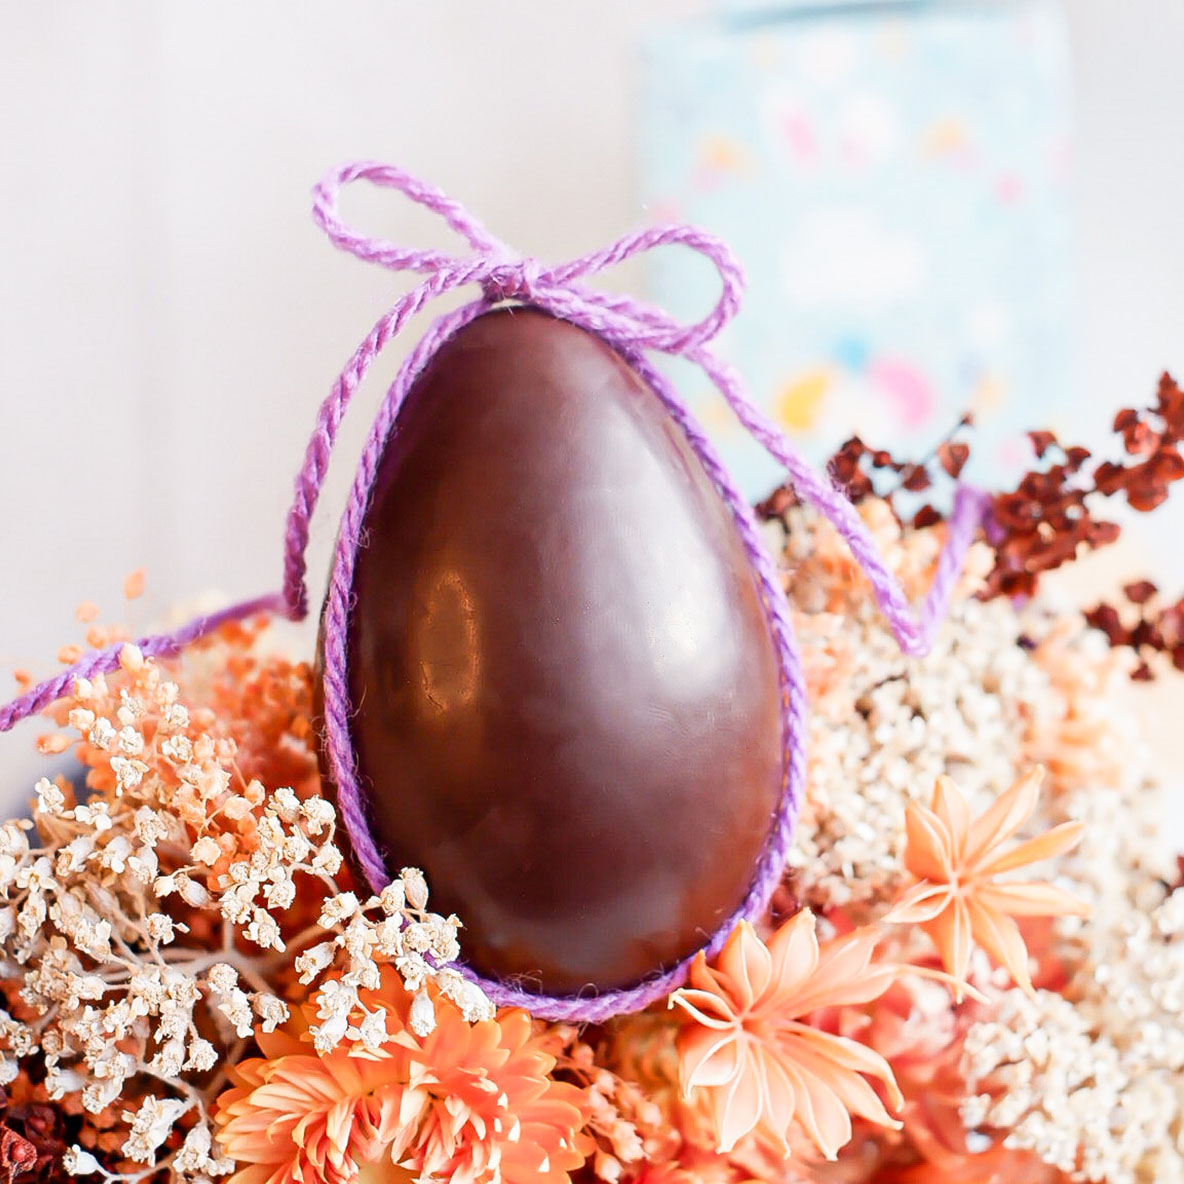 Chocolat de Pâques personnalisés by Mavip